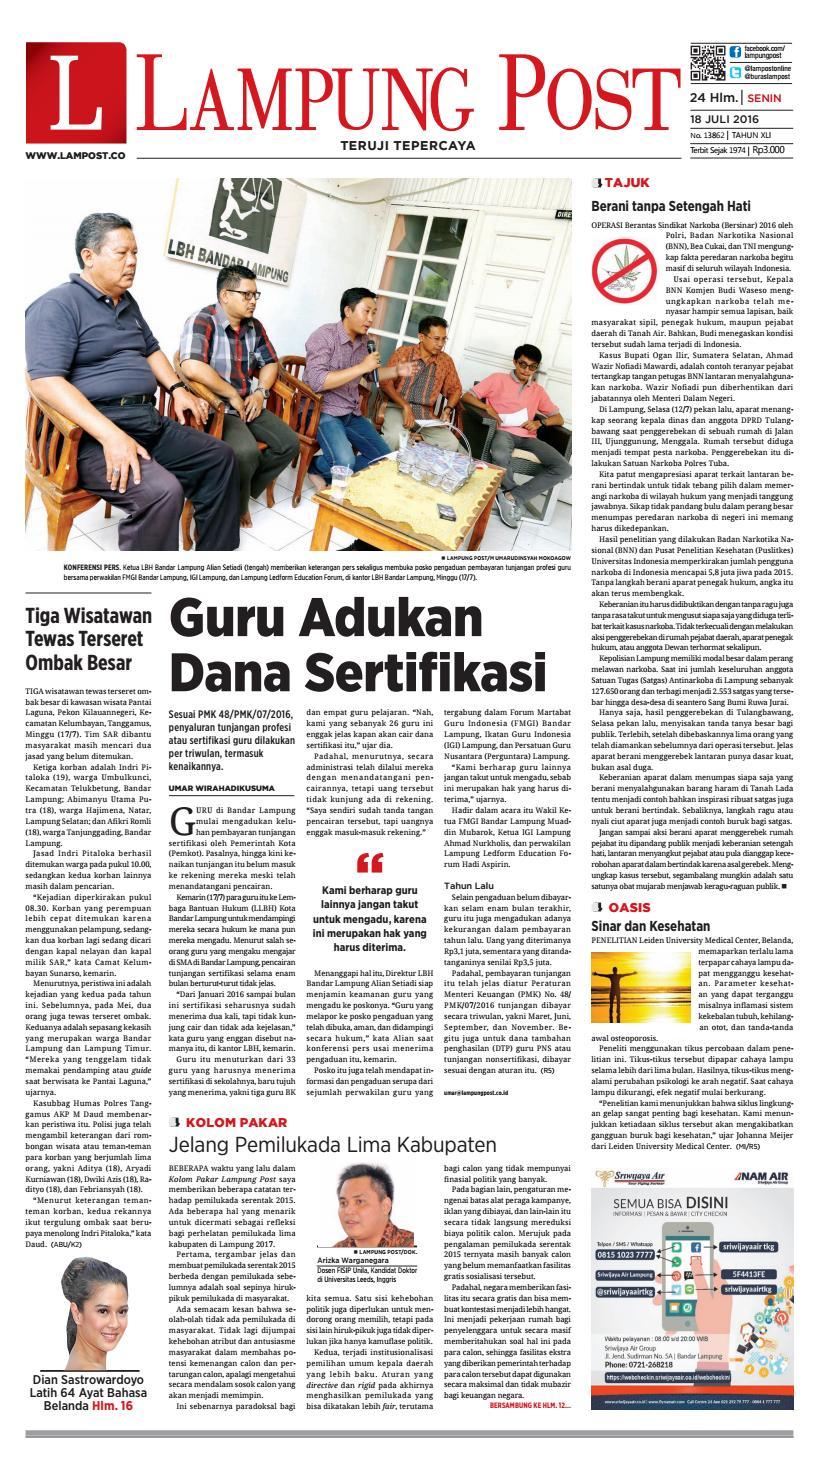 Lampung Post Senin 18 Juli 2016 By Issuu Kue Ulat Sutra Febby Cookies Pal